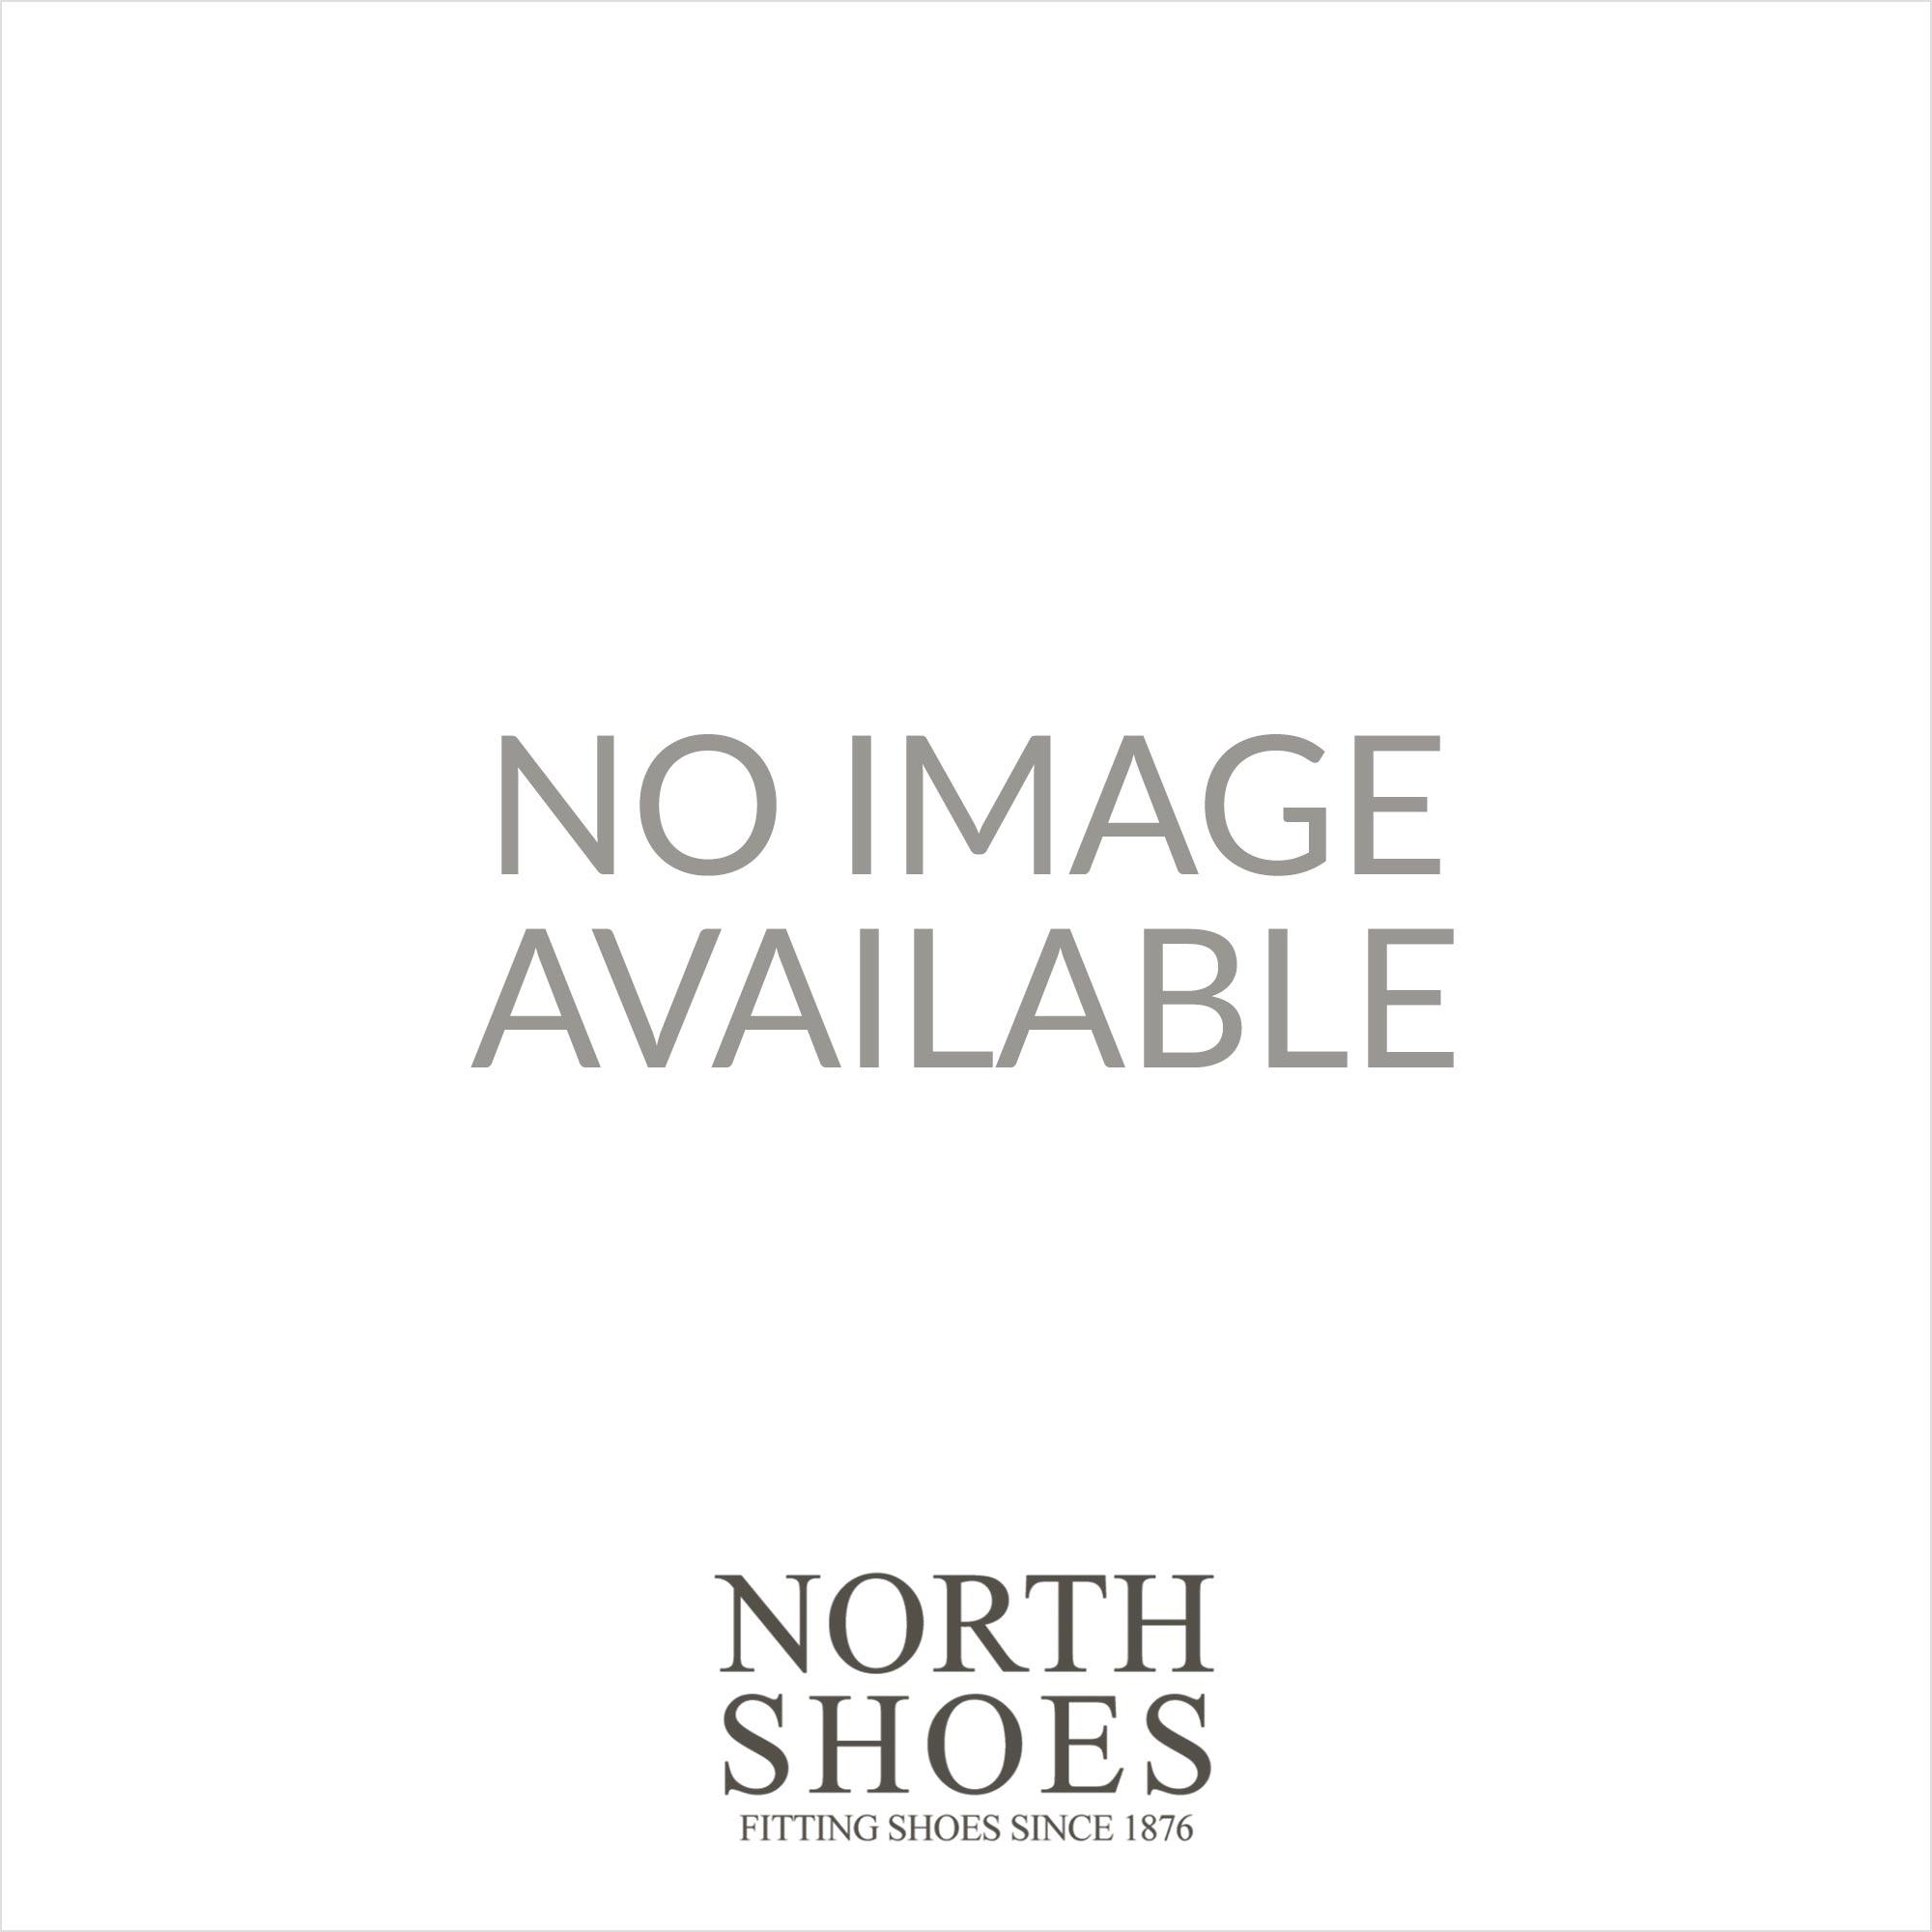 5930c63a8e0d Skechers 14680 Grey Rubber Womens Toe Post Flip Flop Sandal ...